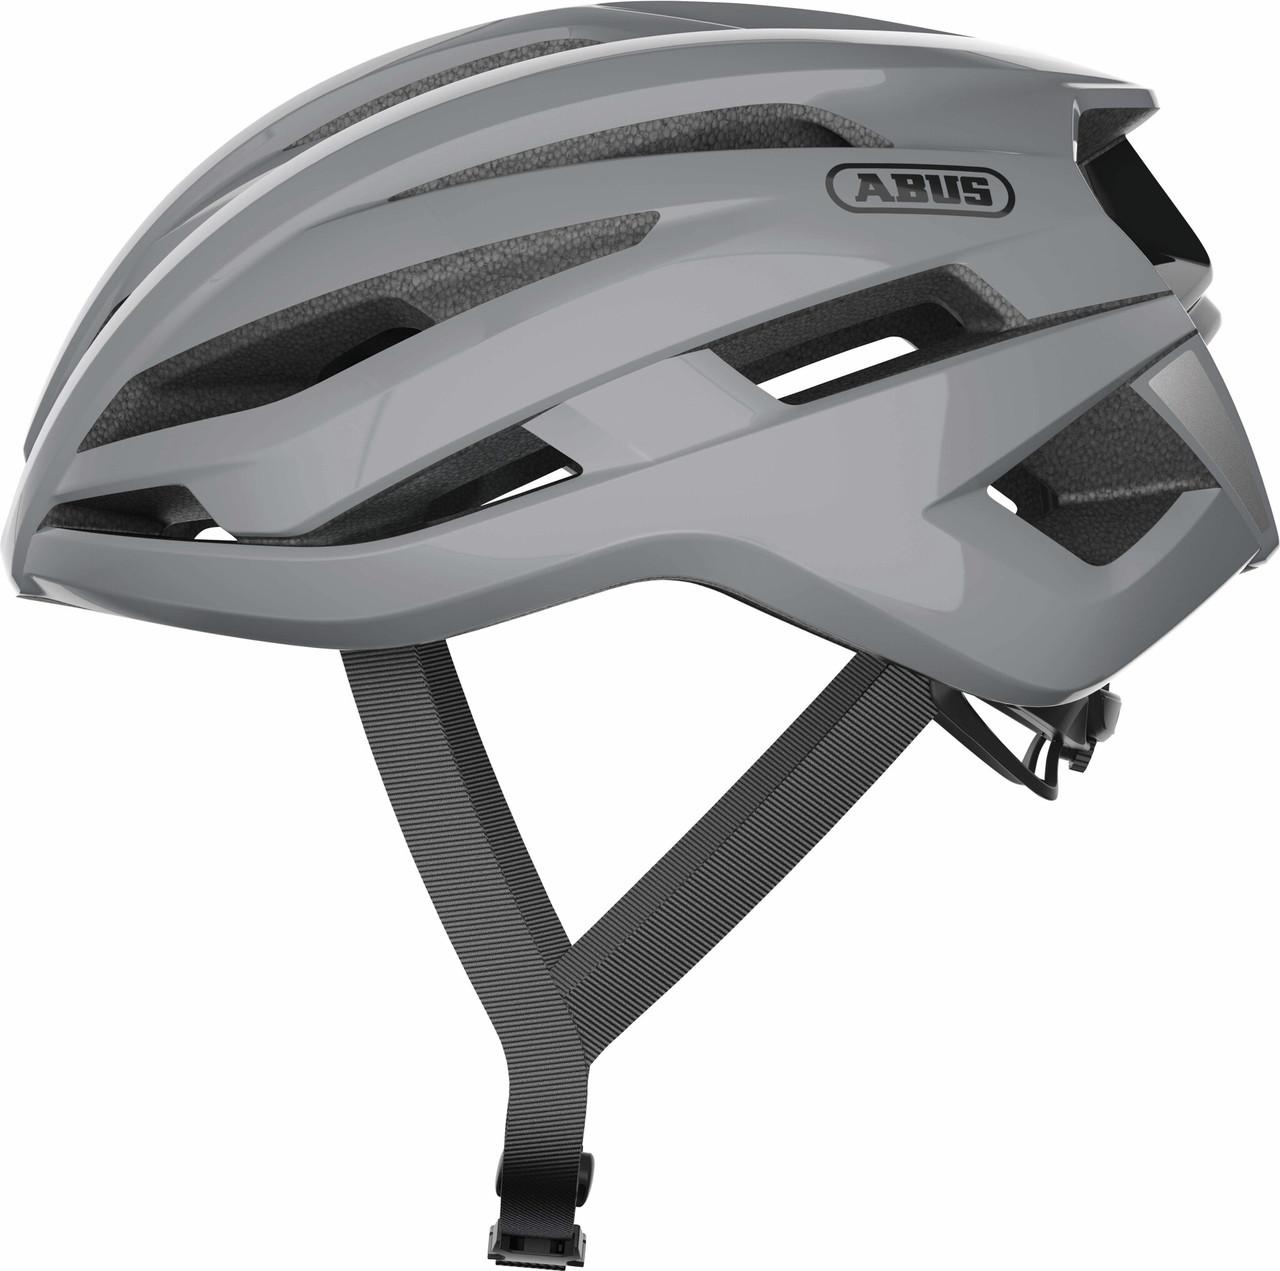 Шолом велосипедний ABUS StormChaser L 59-61 Race Grey